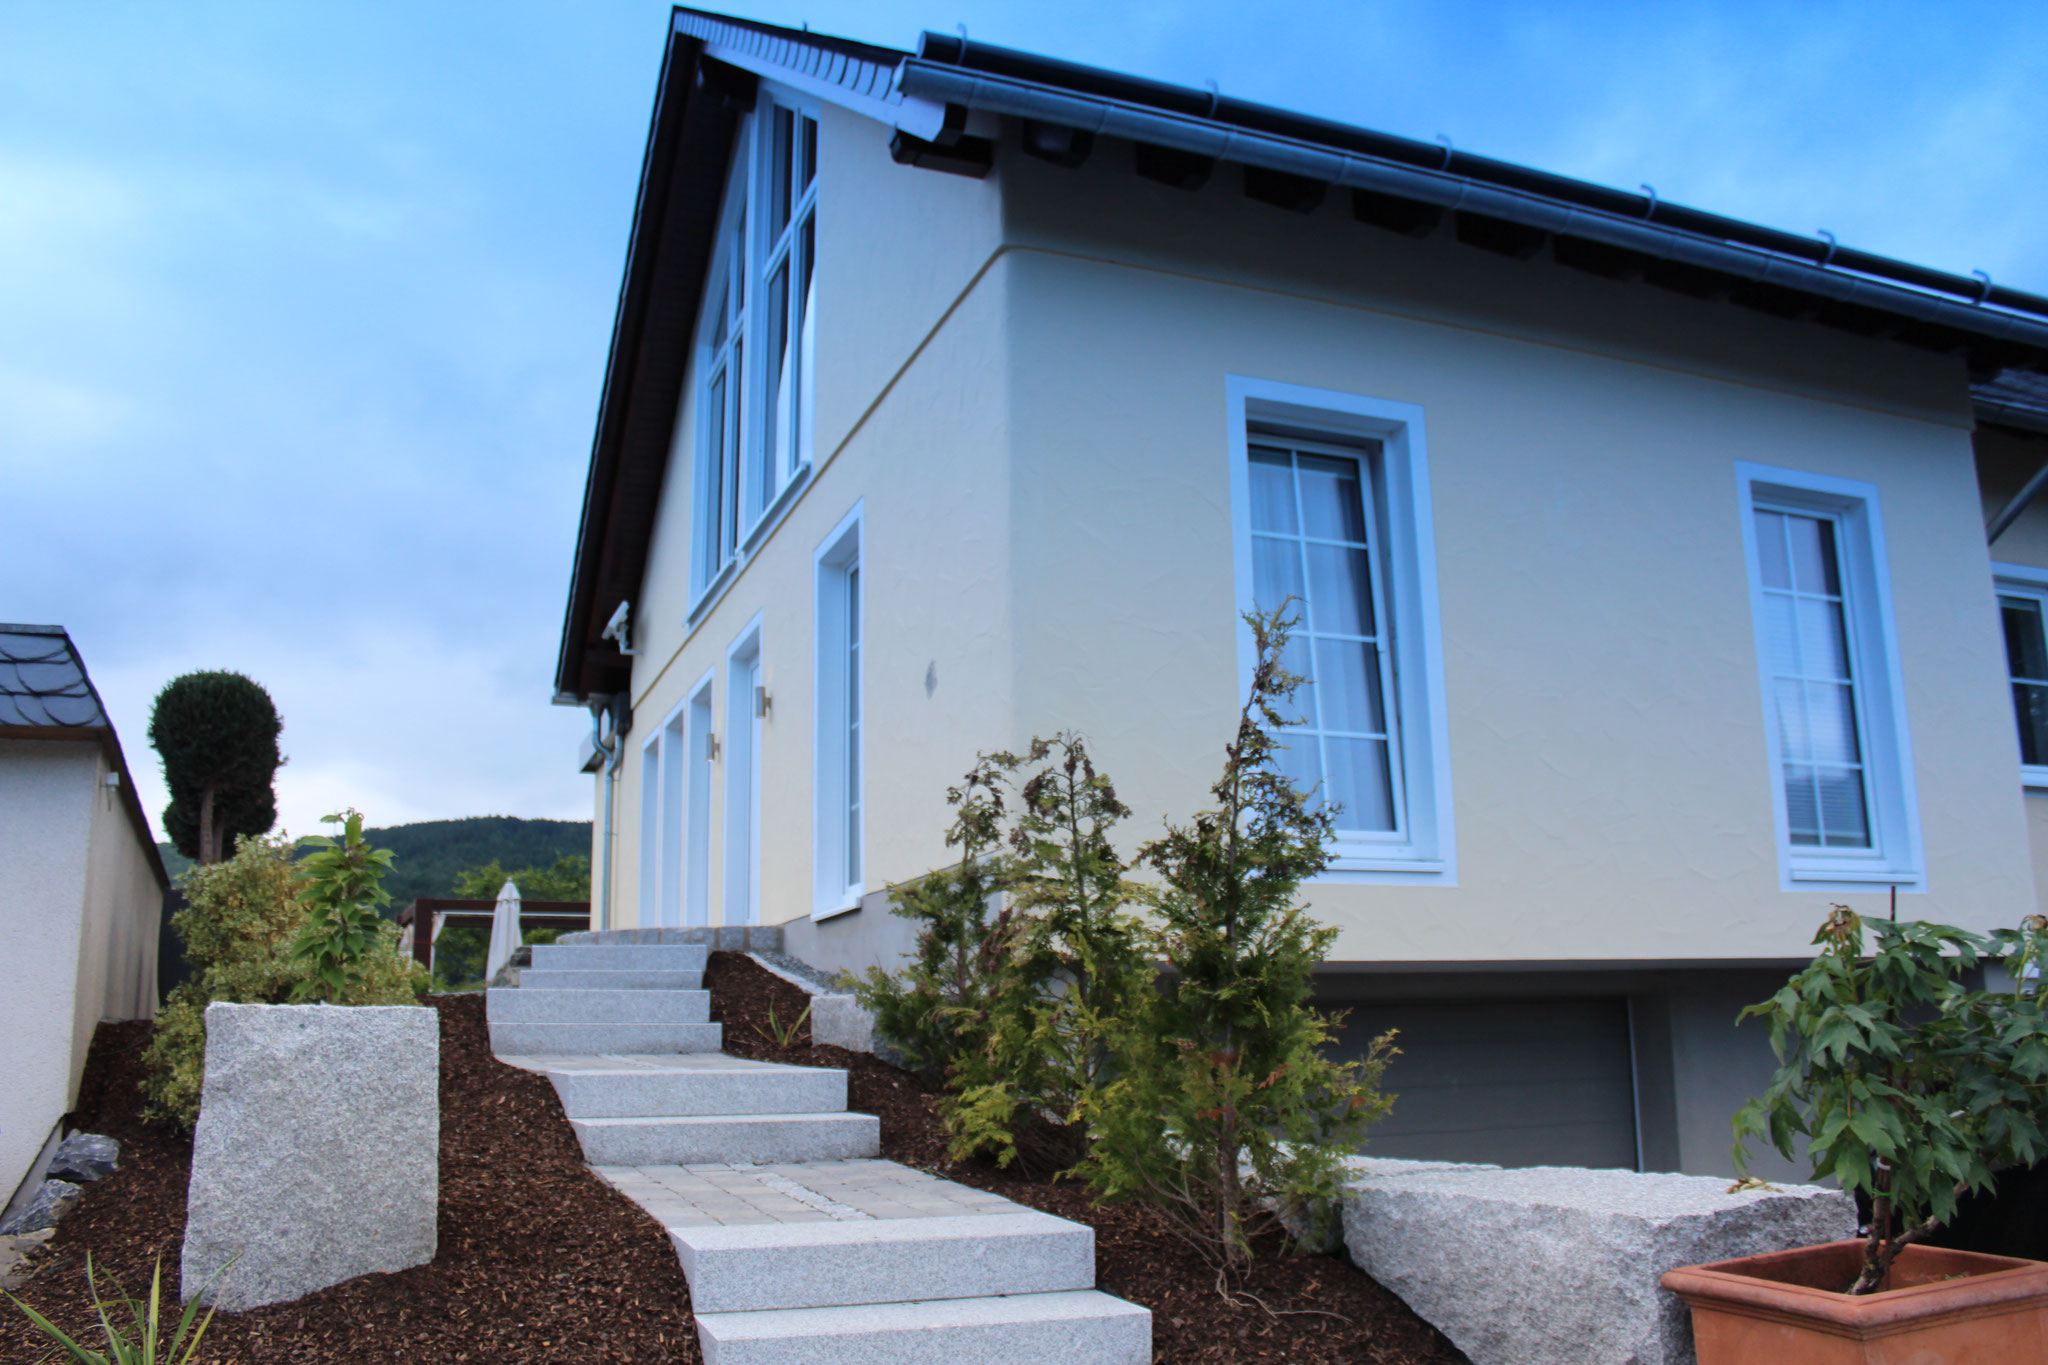 Eingang - 90 qm Wohnung